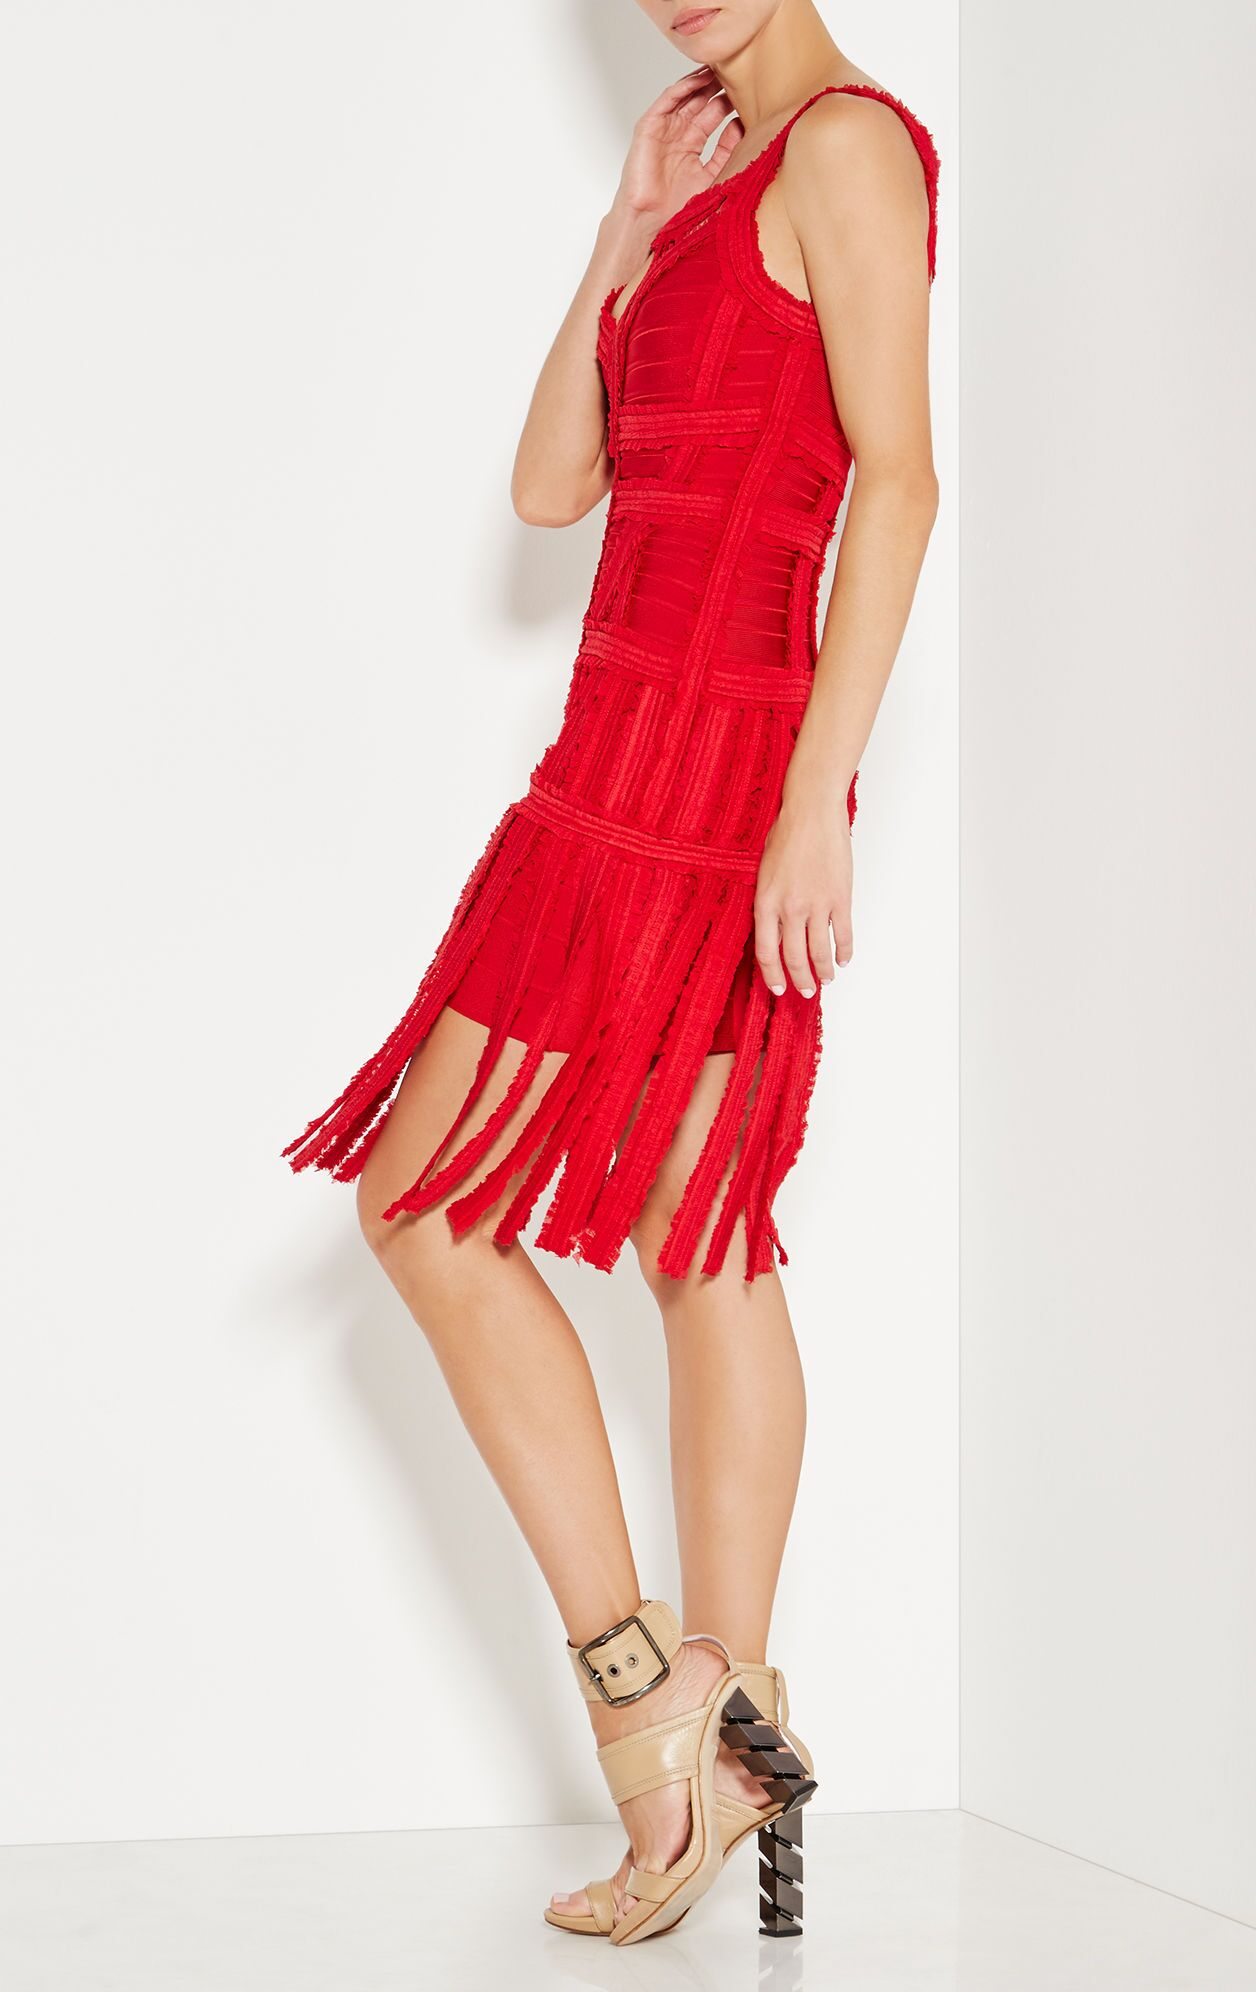 2019 hl nieuwe cocktail party clubwear night out formele fringe kwastje mouwloze chiffon sheer zwart rood wit vrouwen bandage jurk - 5